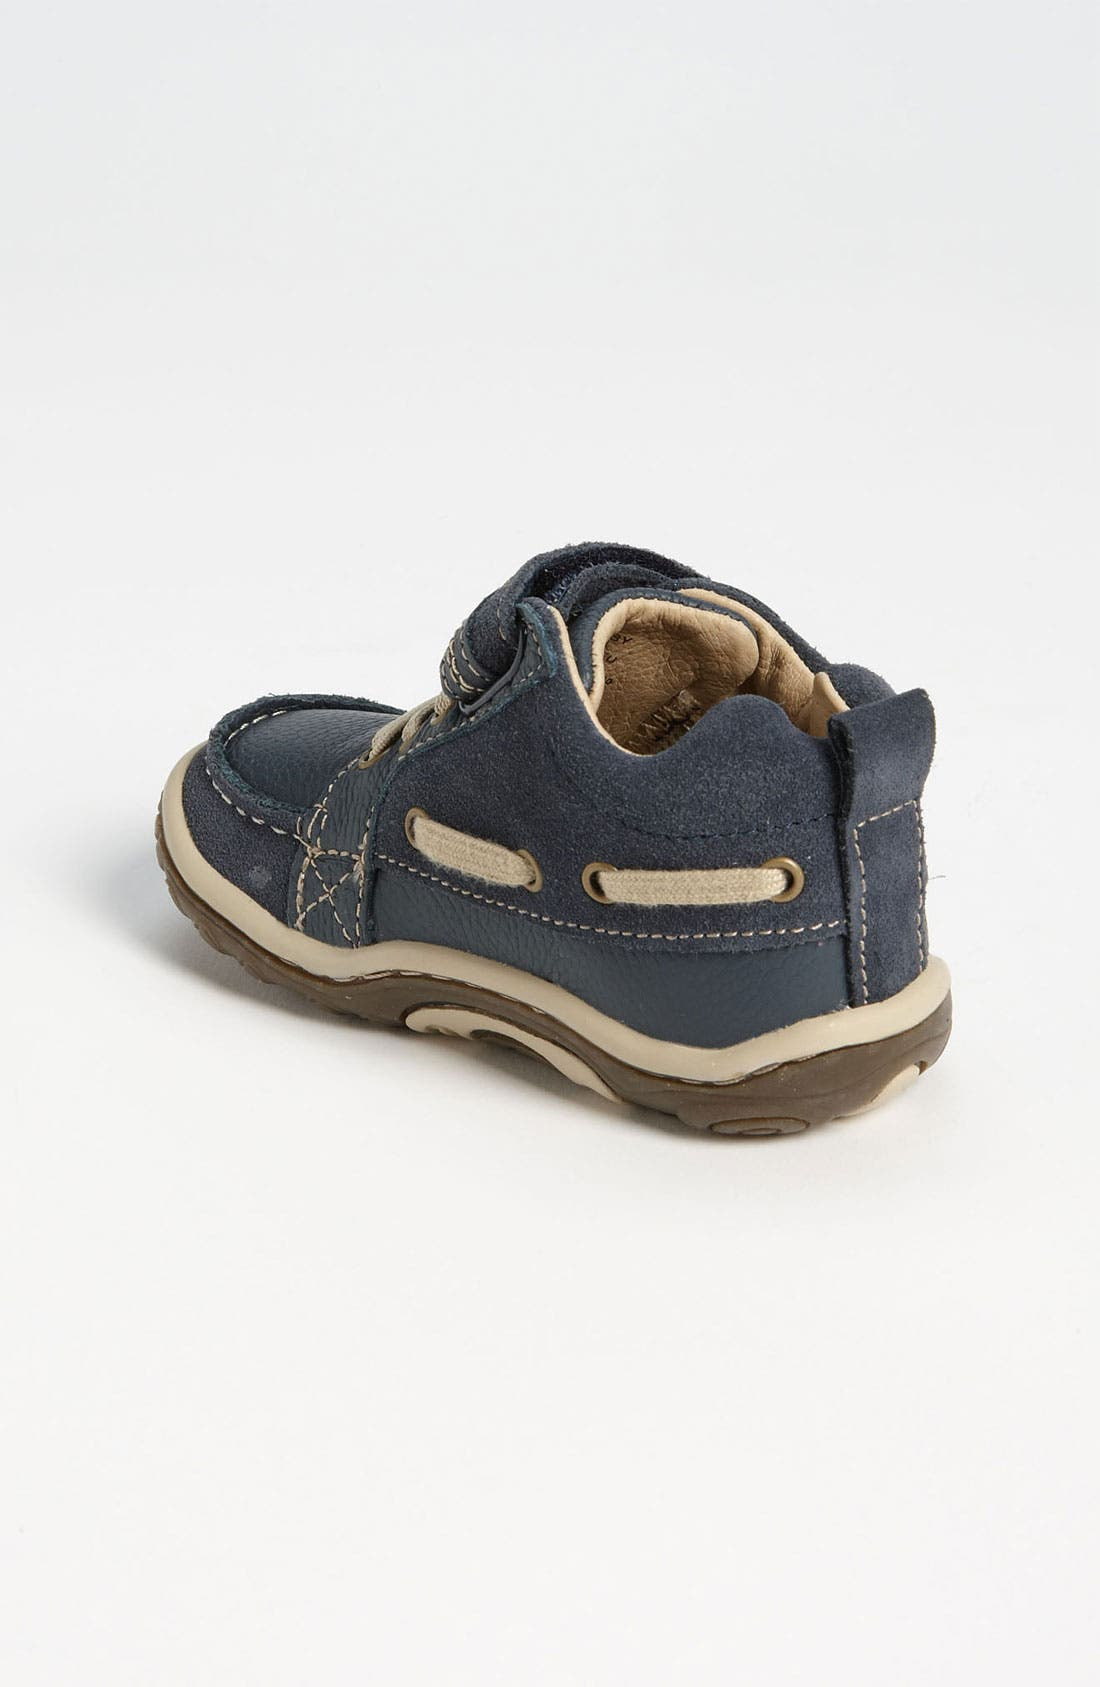 Alternate Image 2  - Stride Rite 'Toby' Sneaker (Baby, Walker & Toddler)